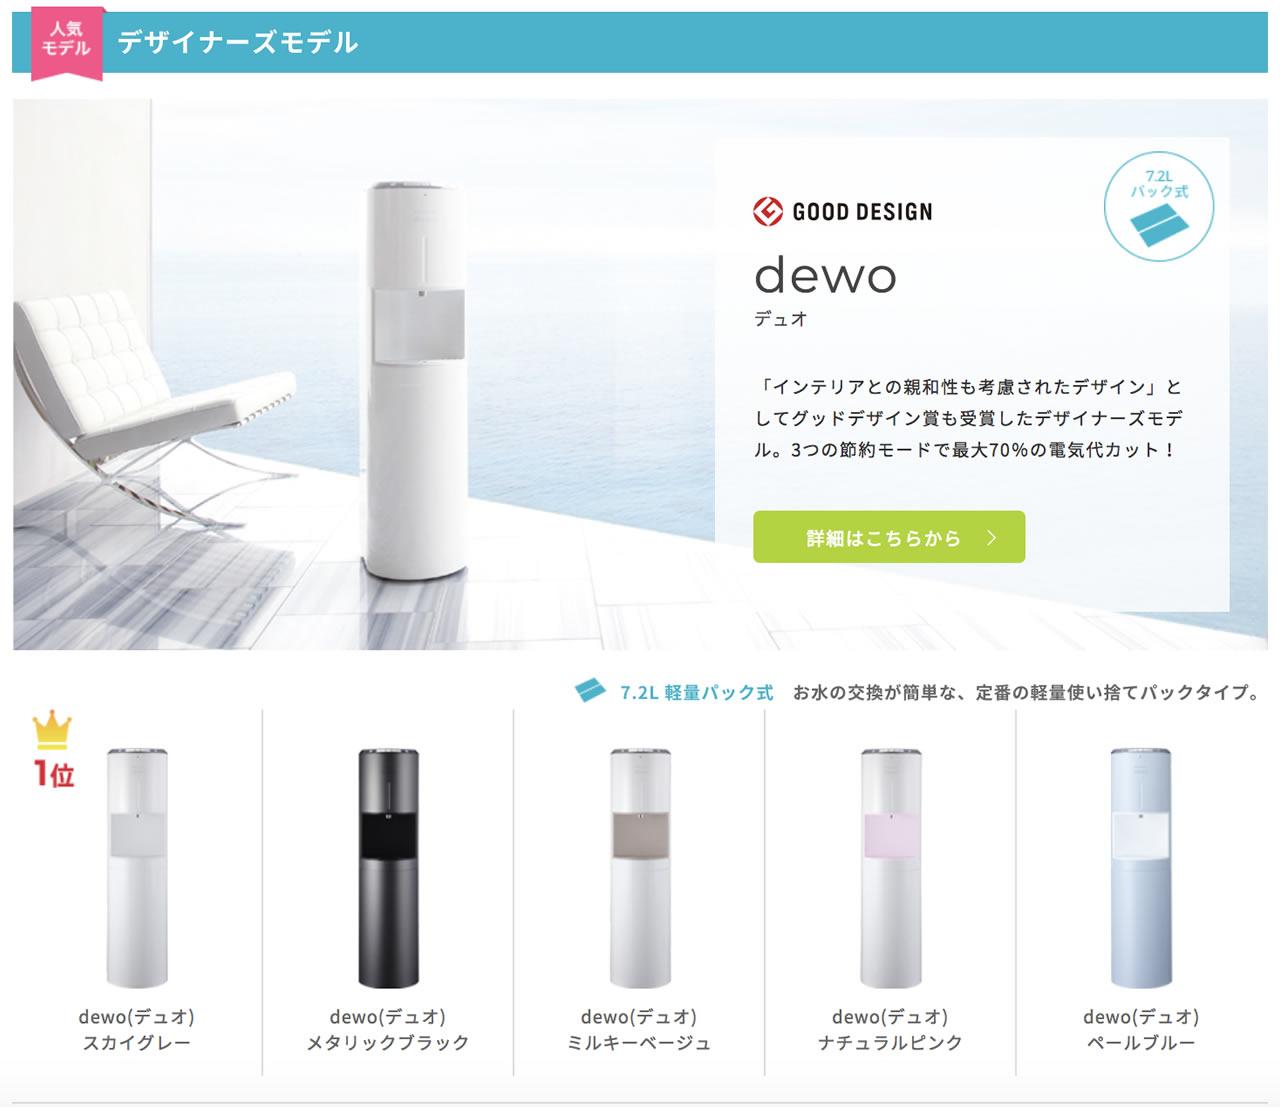 GOODDESING賞受賞「dewo(デュオ)」